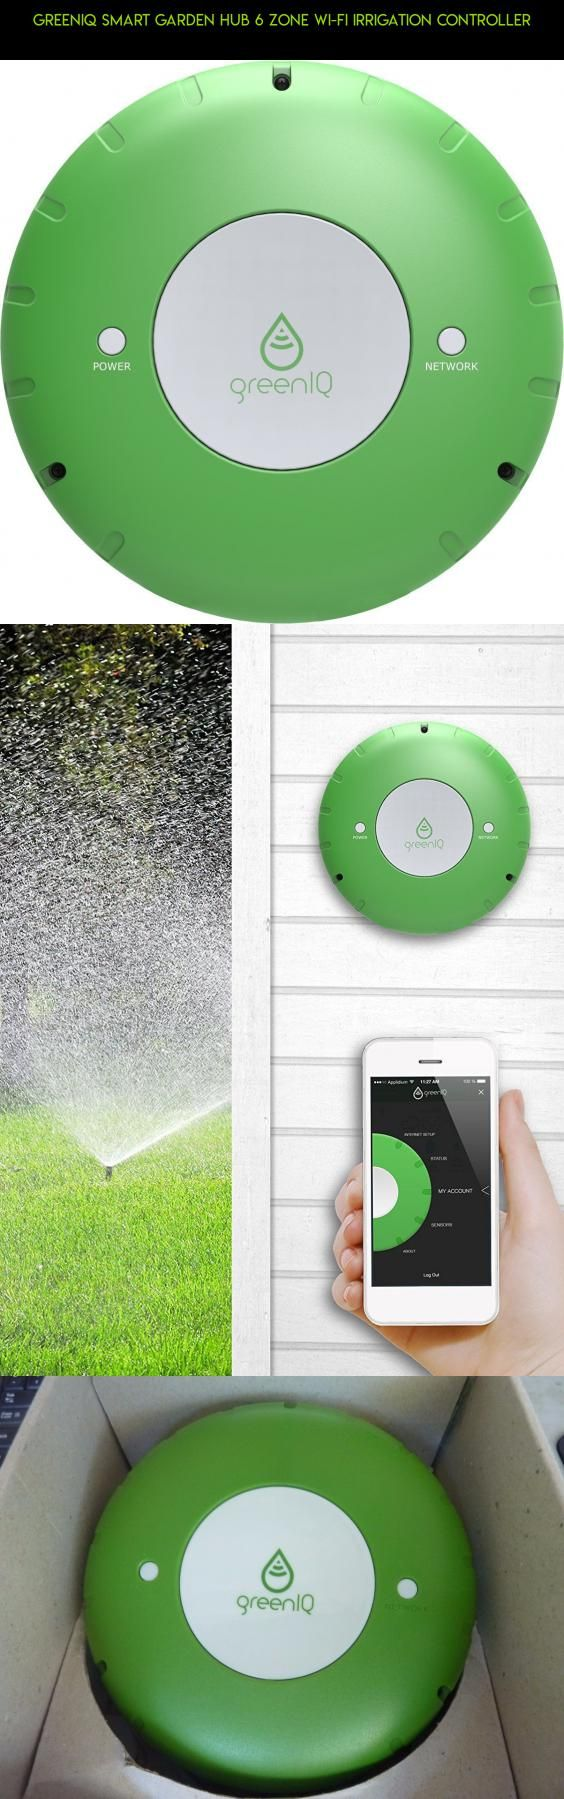 GreenIQ Smart Garden Hub 6 Zone Wi-Fi Irrigation Controller #parts #camera #plans #drone #kit #fpv #technology #tech #gardening #gadgets #racing #products #shopping #zones